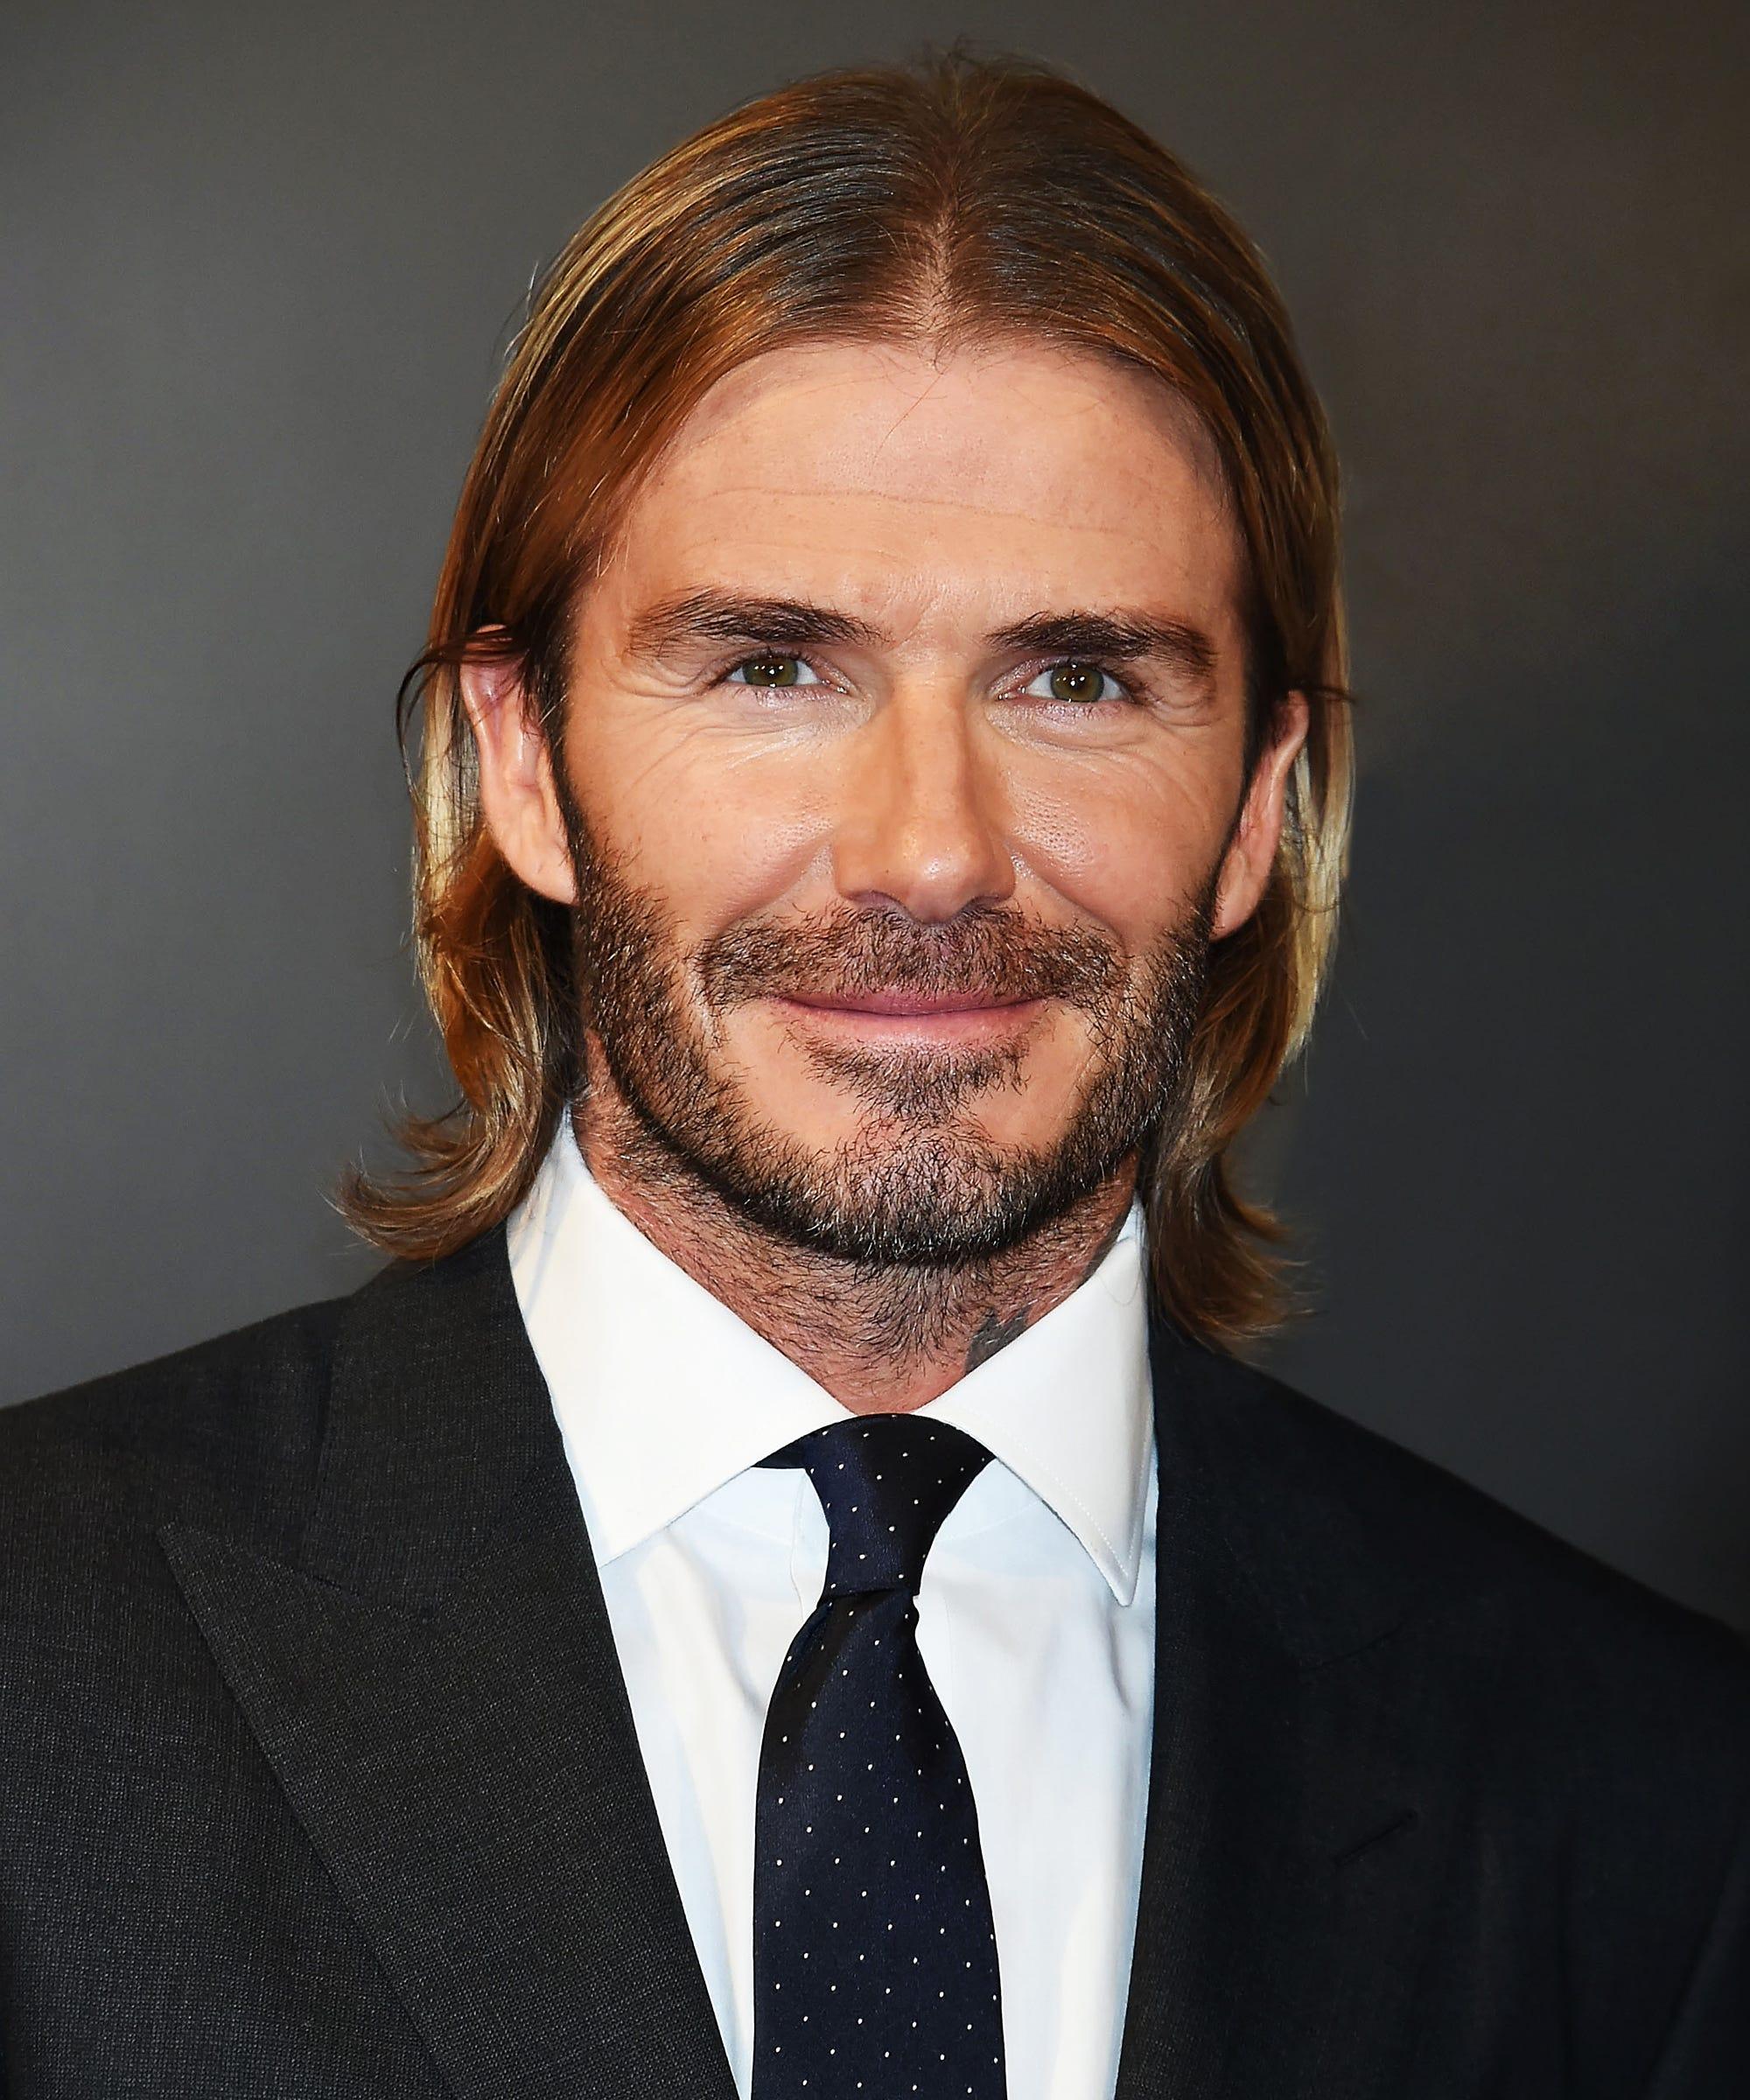 David Beckham House 99 Loreal Launch 2018 Hair Skin